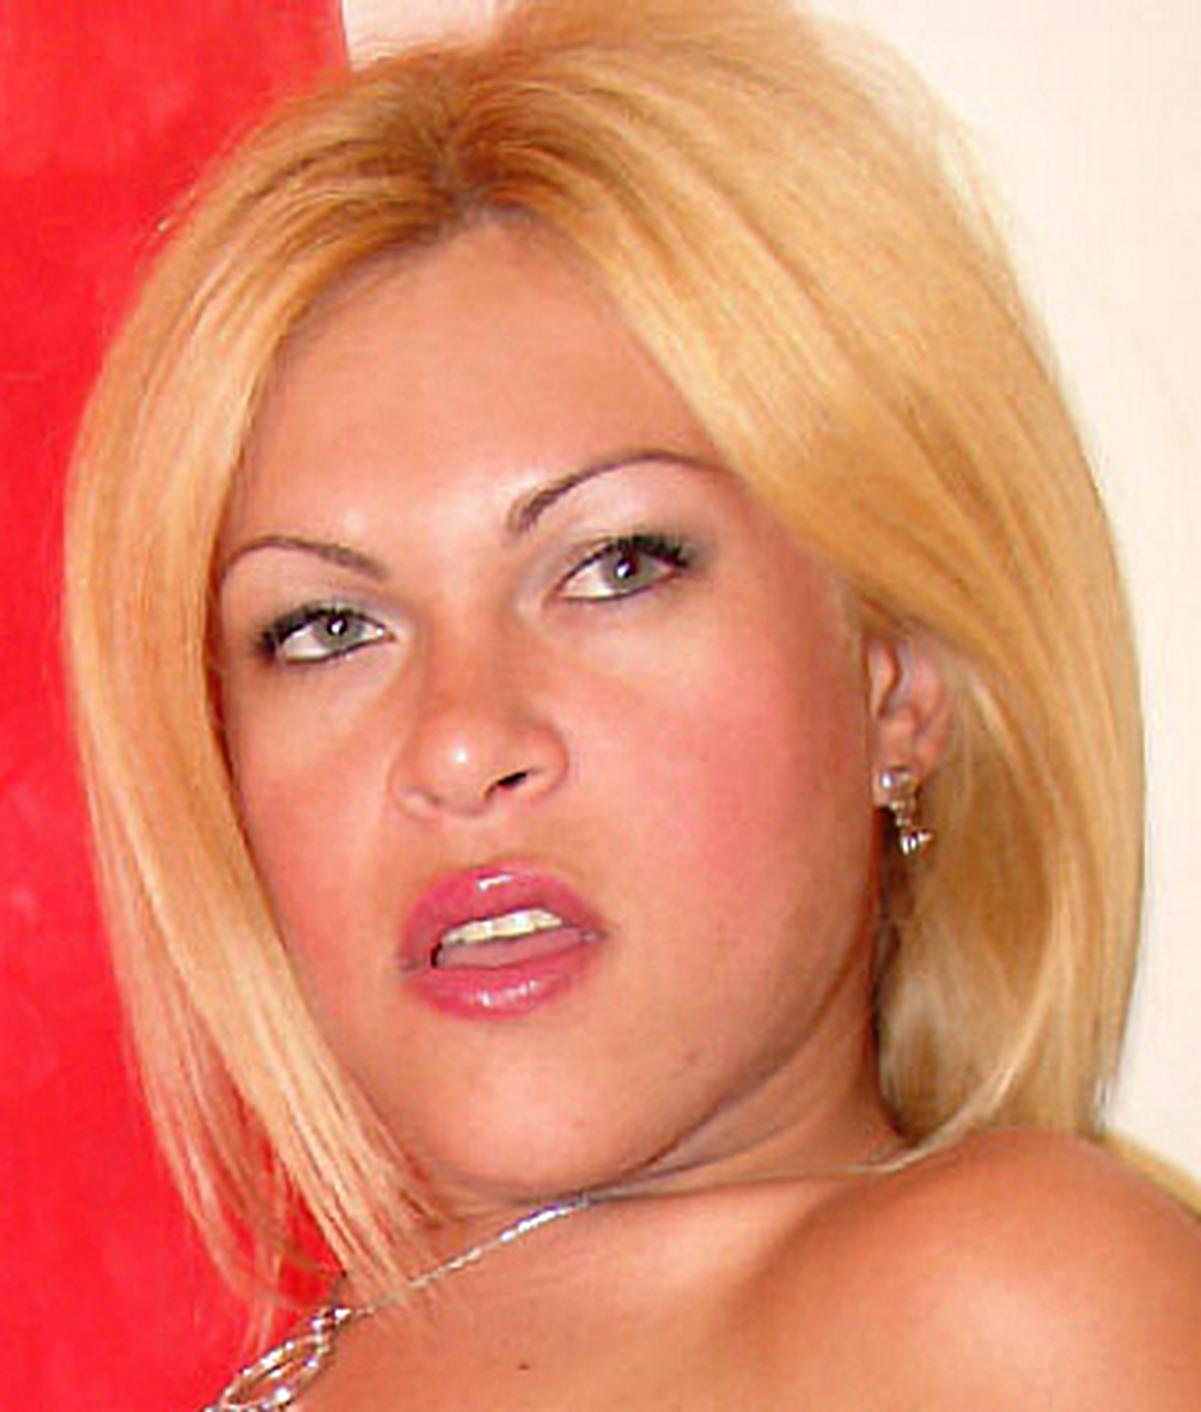 Giselle Lins